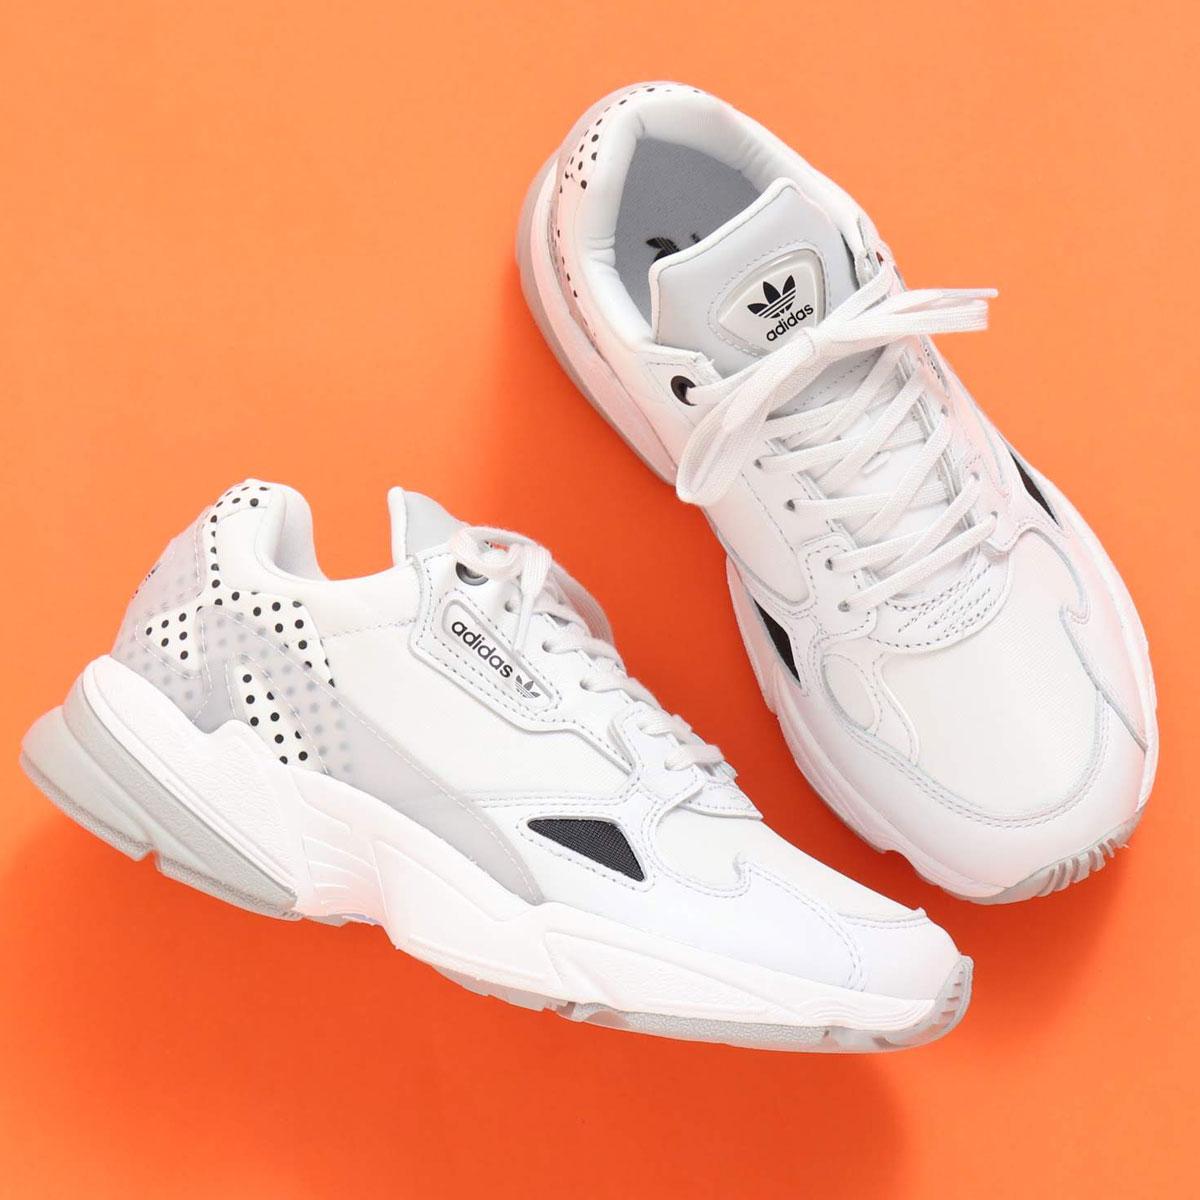 adidas ADIDASFALCON W(アディダス ファルコン)CRYSTAL WHITE/CORE BLACK/GRAY TWO【メンズ レディース スニーカー】20SS-I